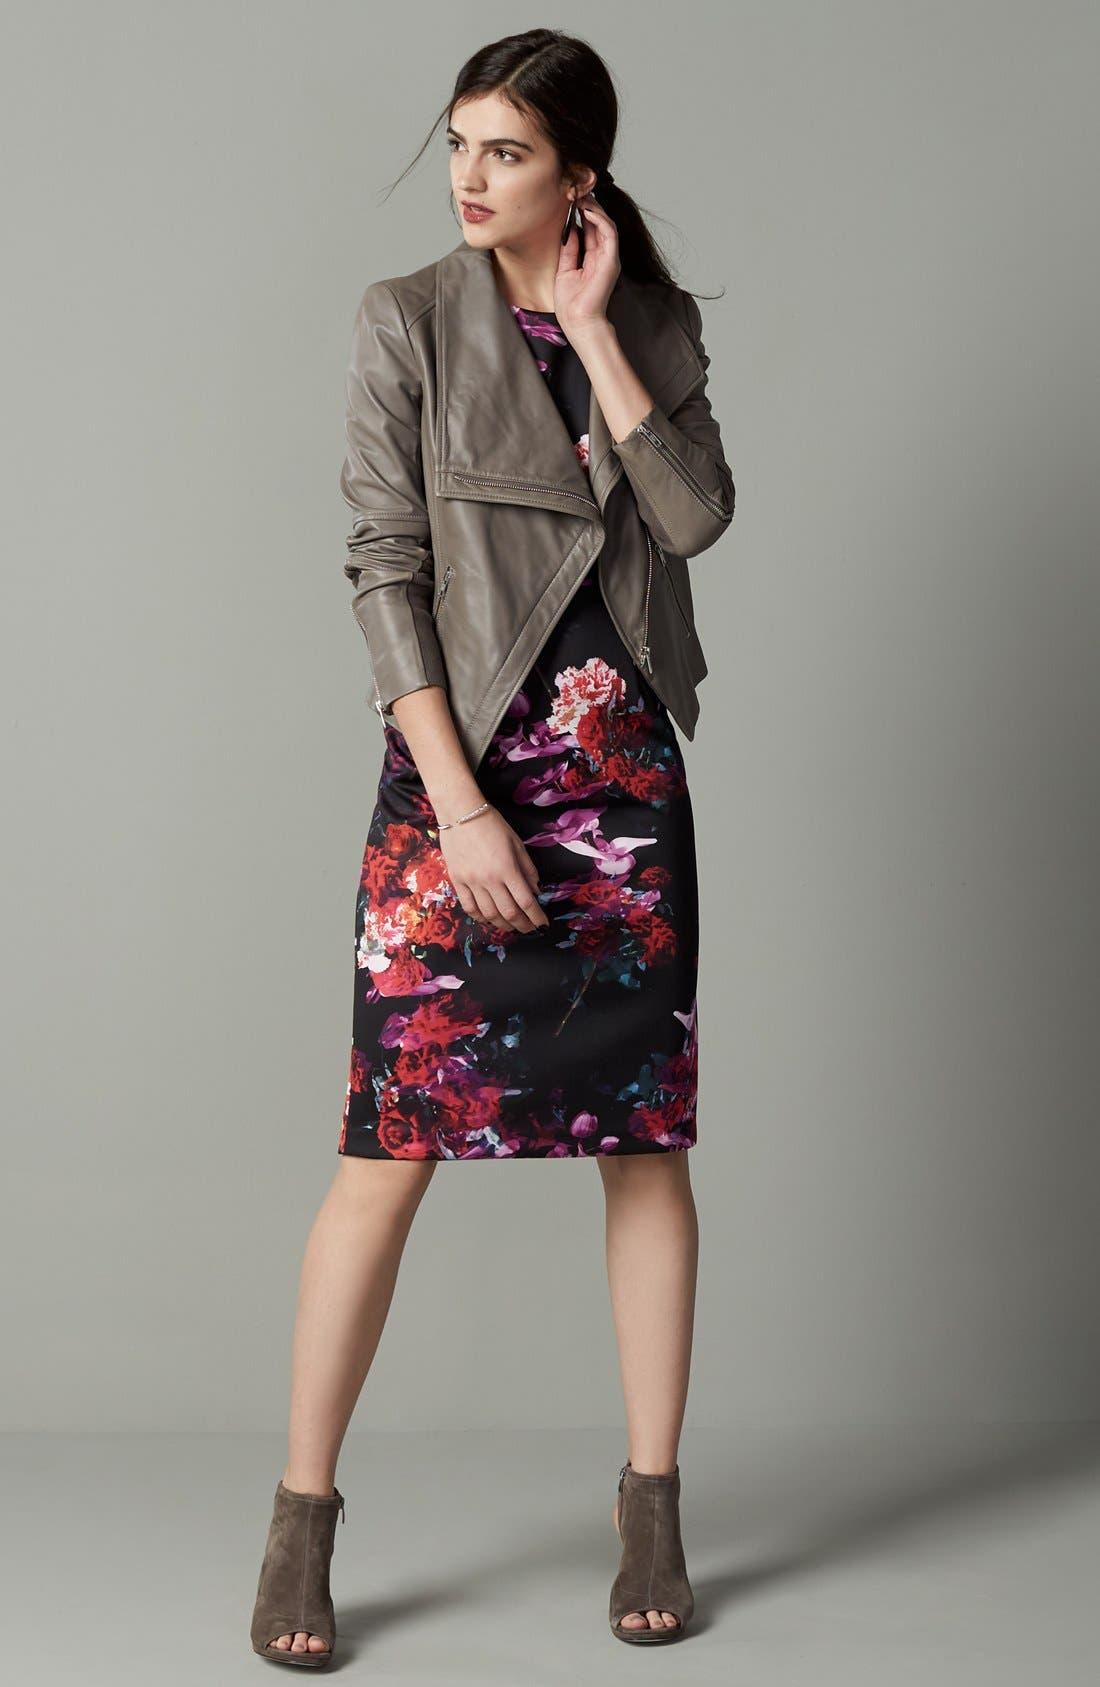 Floral Print Knit Sheath Dress,                             Alternate thumbnail 2, color,                             006